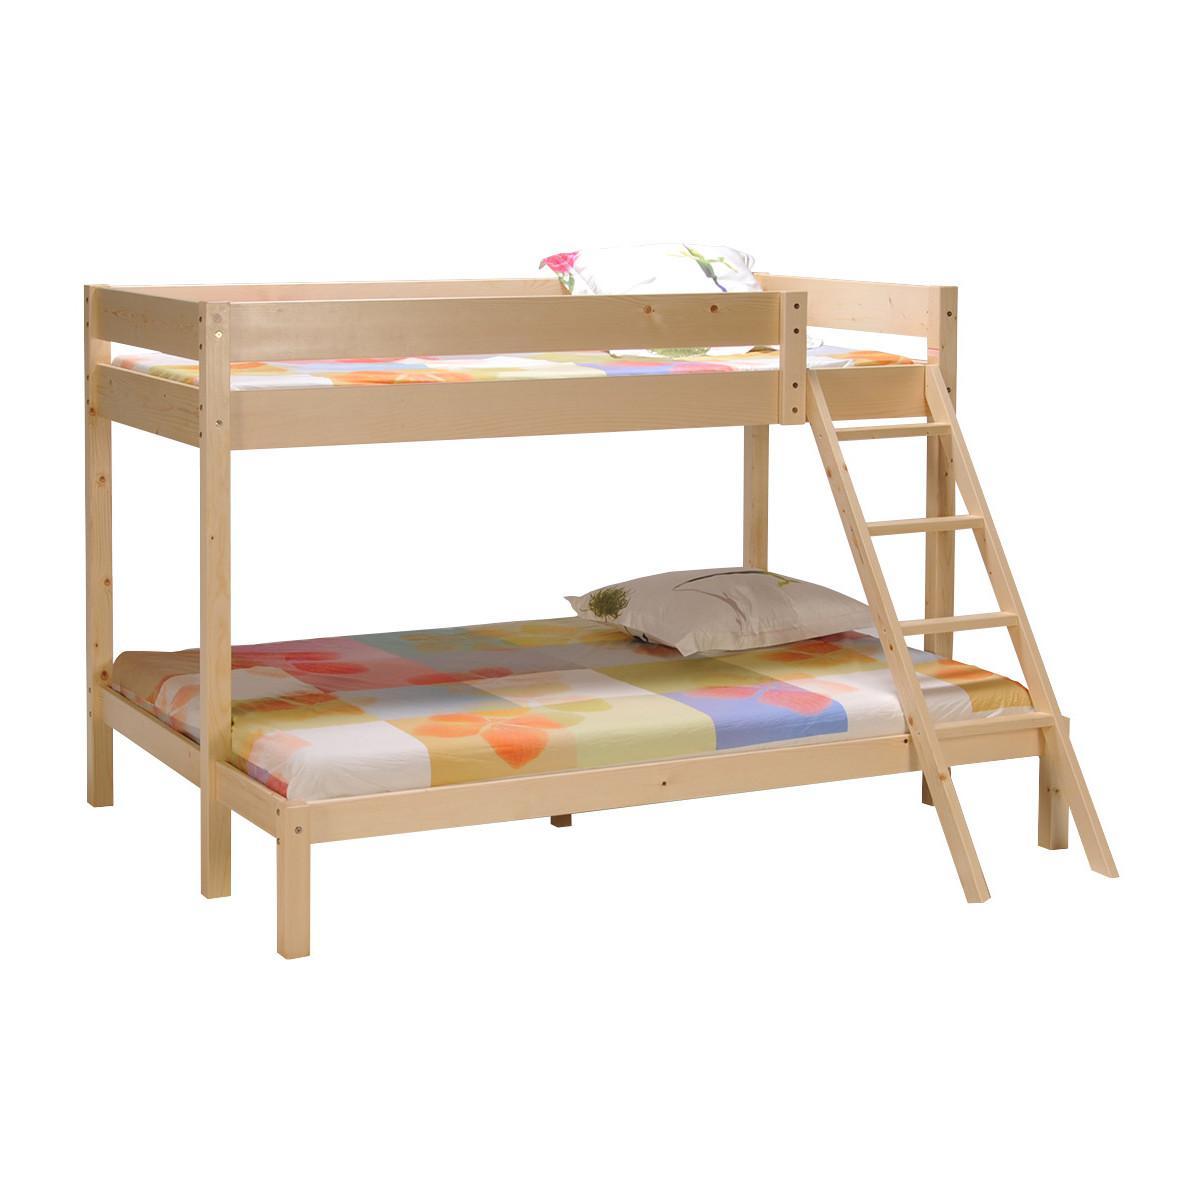 lit superpos tribal 90 140 x 190 cm en pic a massif sommiers 80 sur la carte waaoh. Black Bedroom Furniture Sets. Home Design Ideas